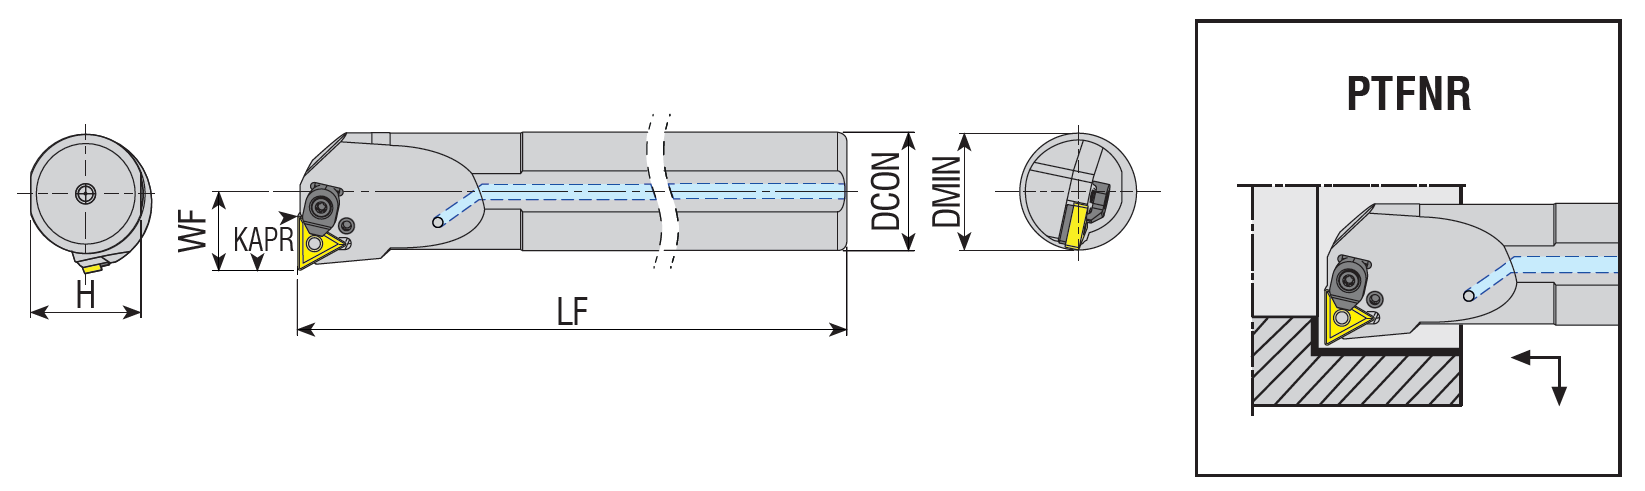 Bohrstangen mit Innenkühlung PTFNR / PTFNL